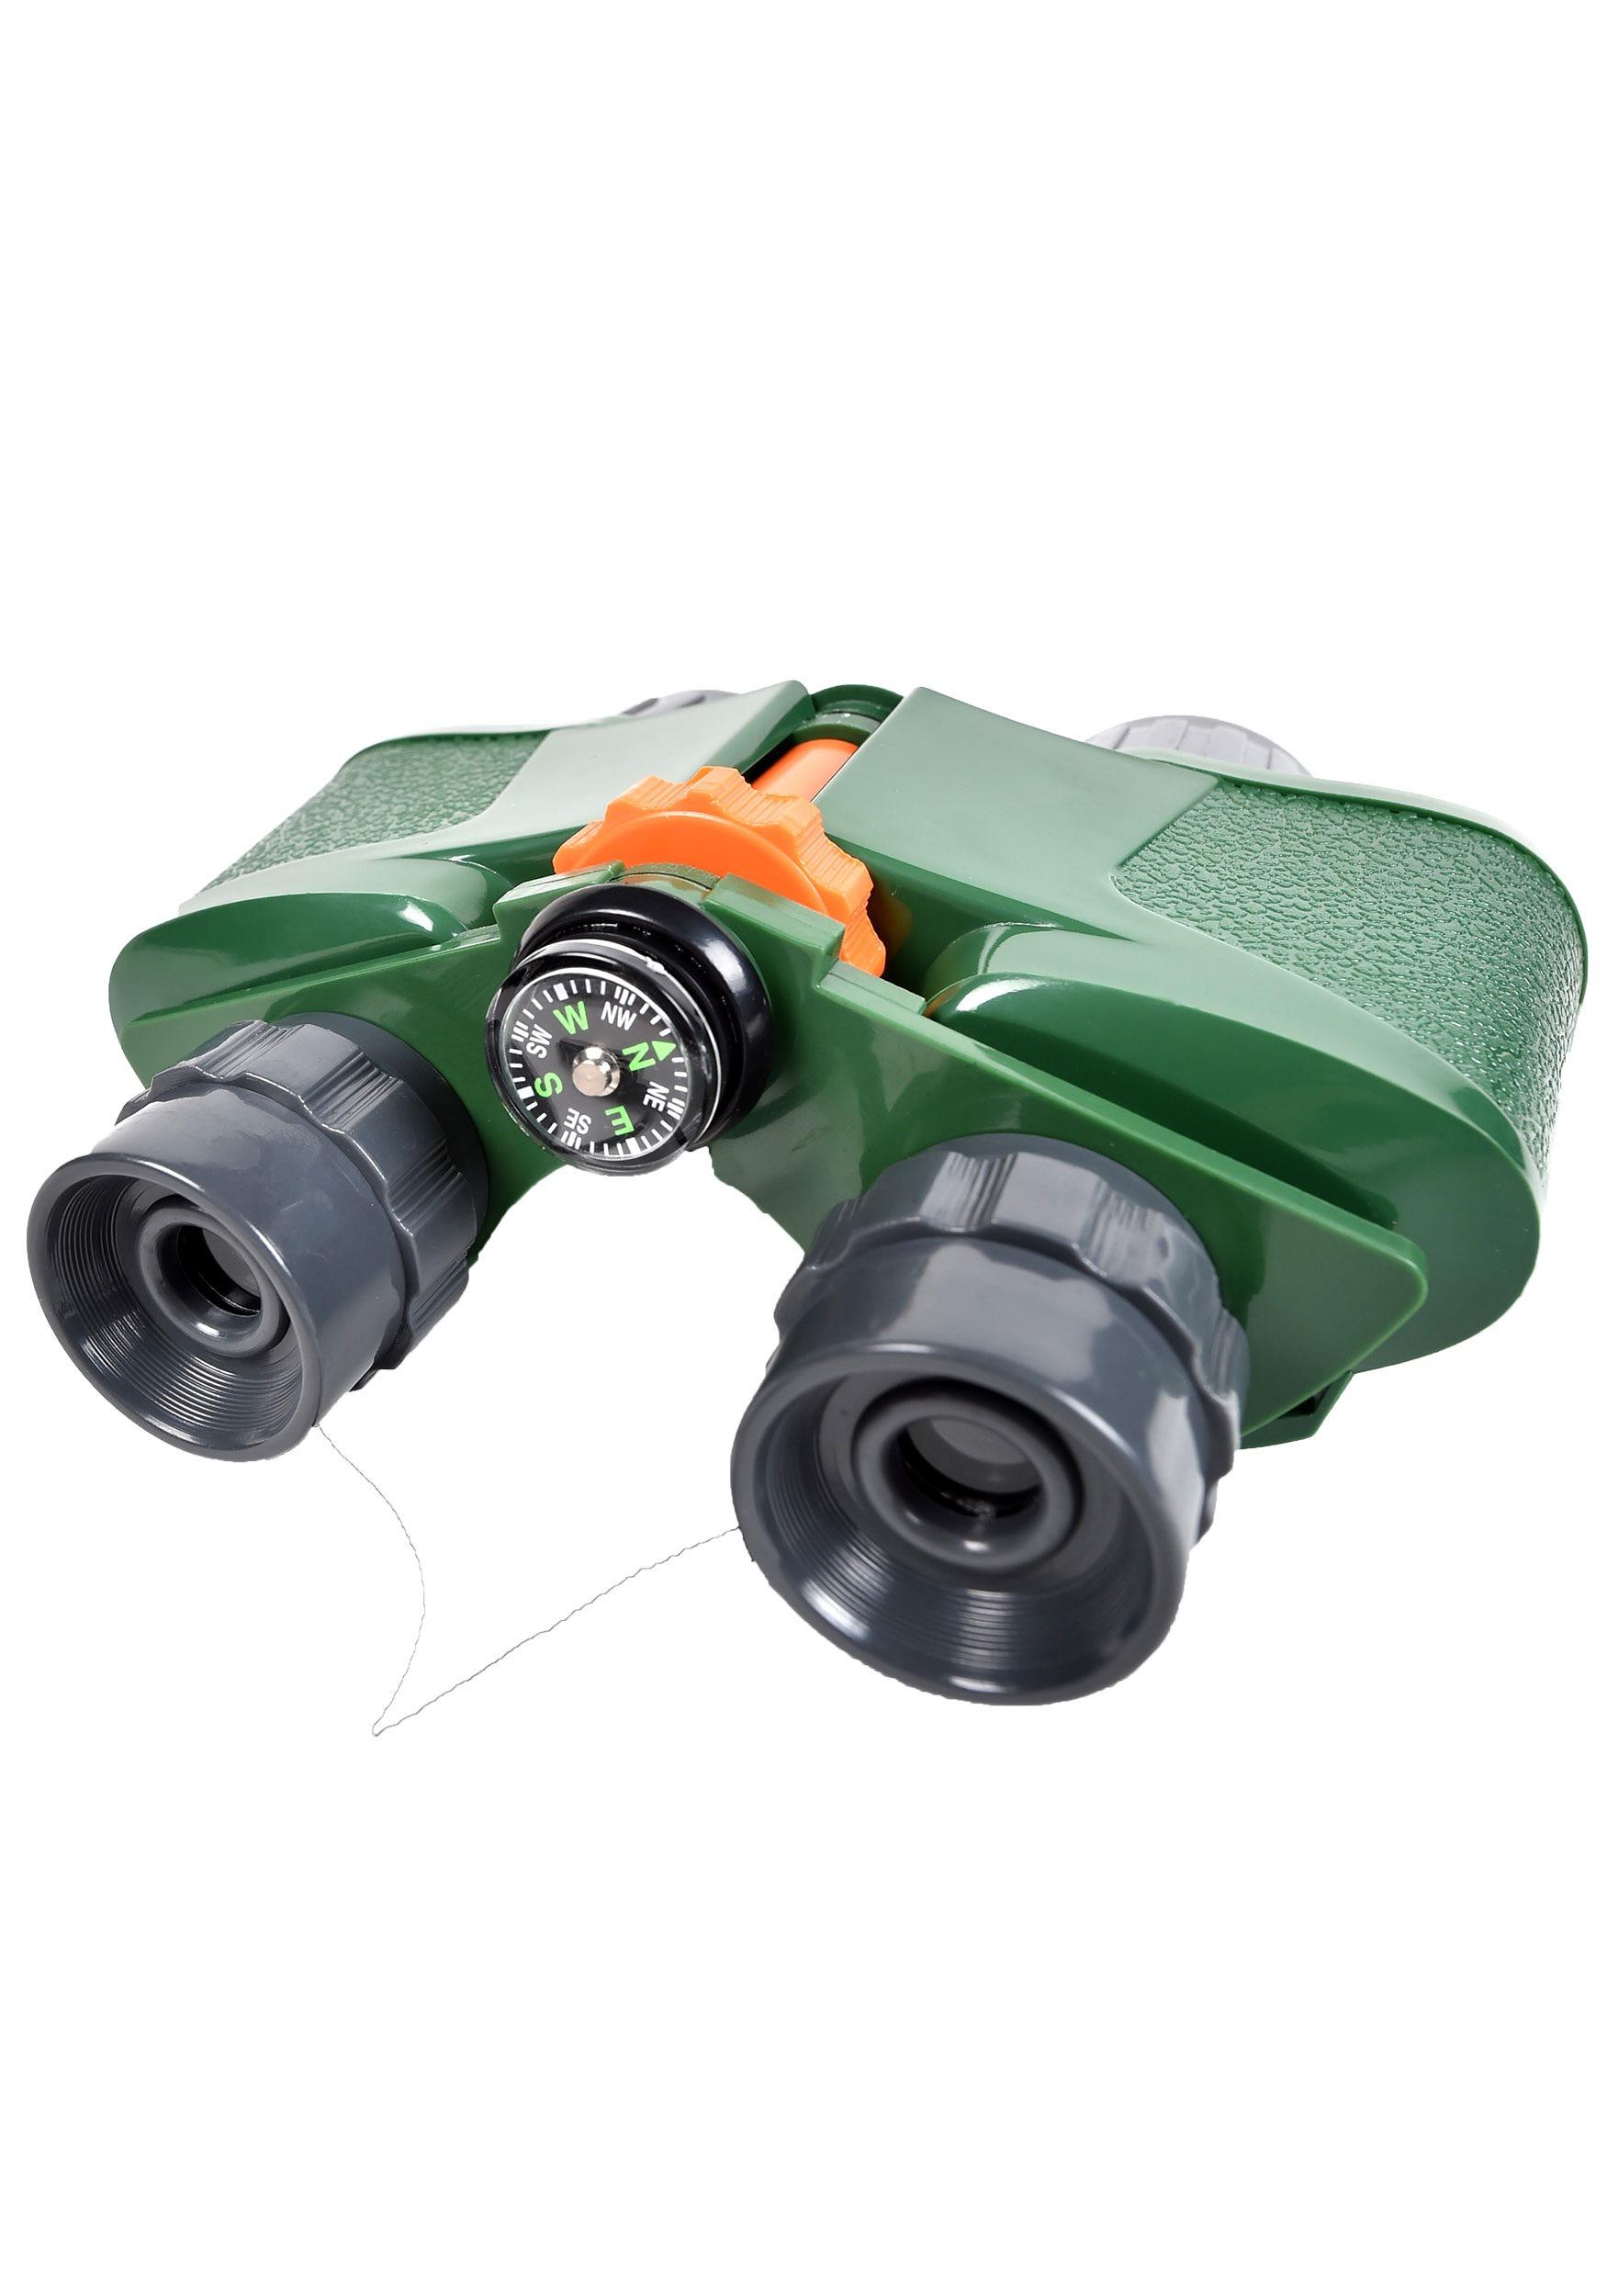 Maxx Action Toy Hunting Binoculars SND10503